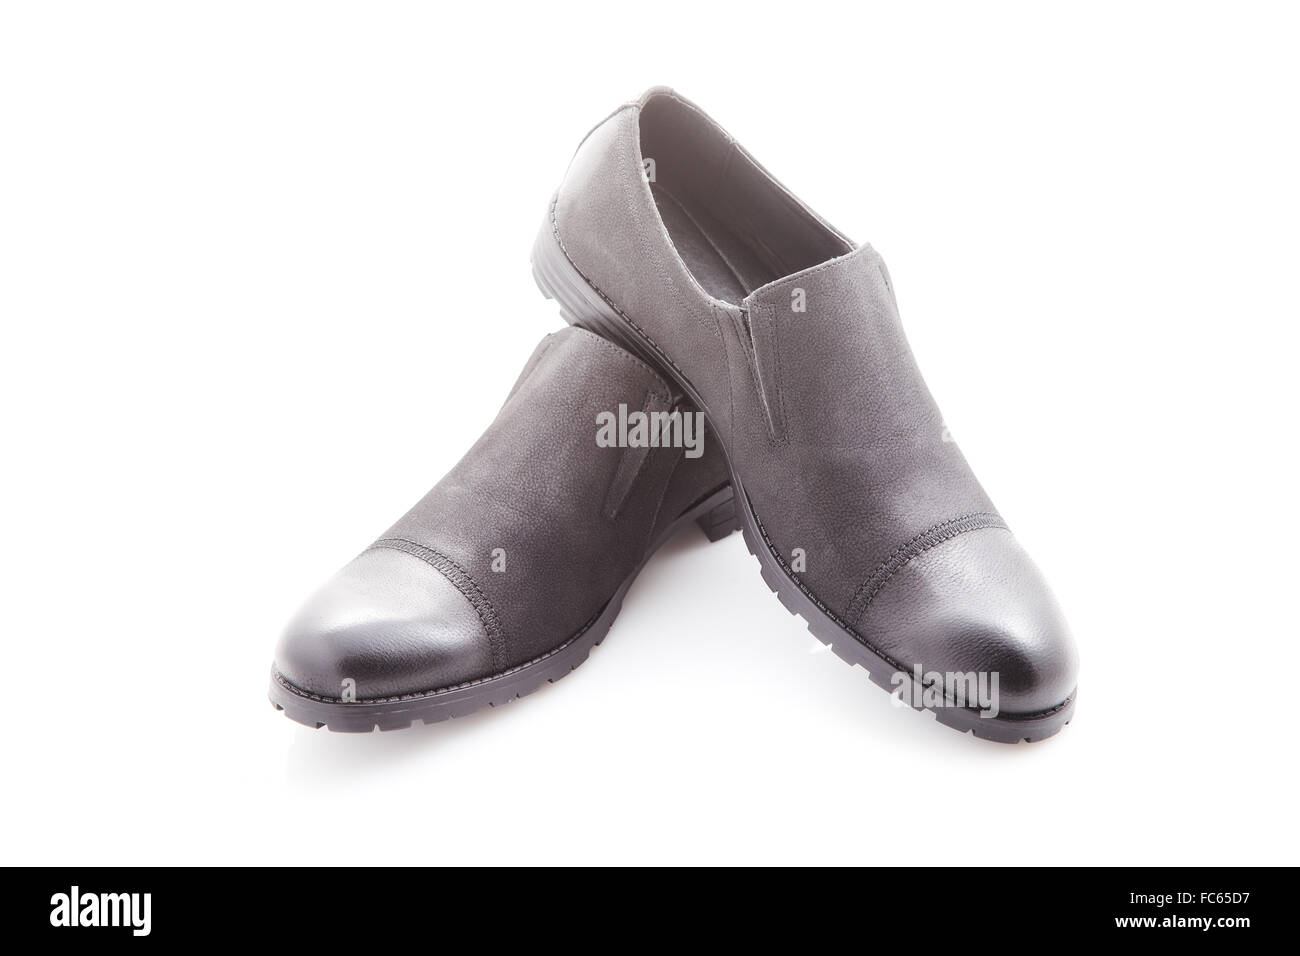 30f0b5cf men's dress shoes on a white background Stock Photo: 93563715 - Alamy